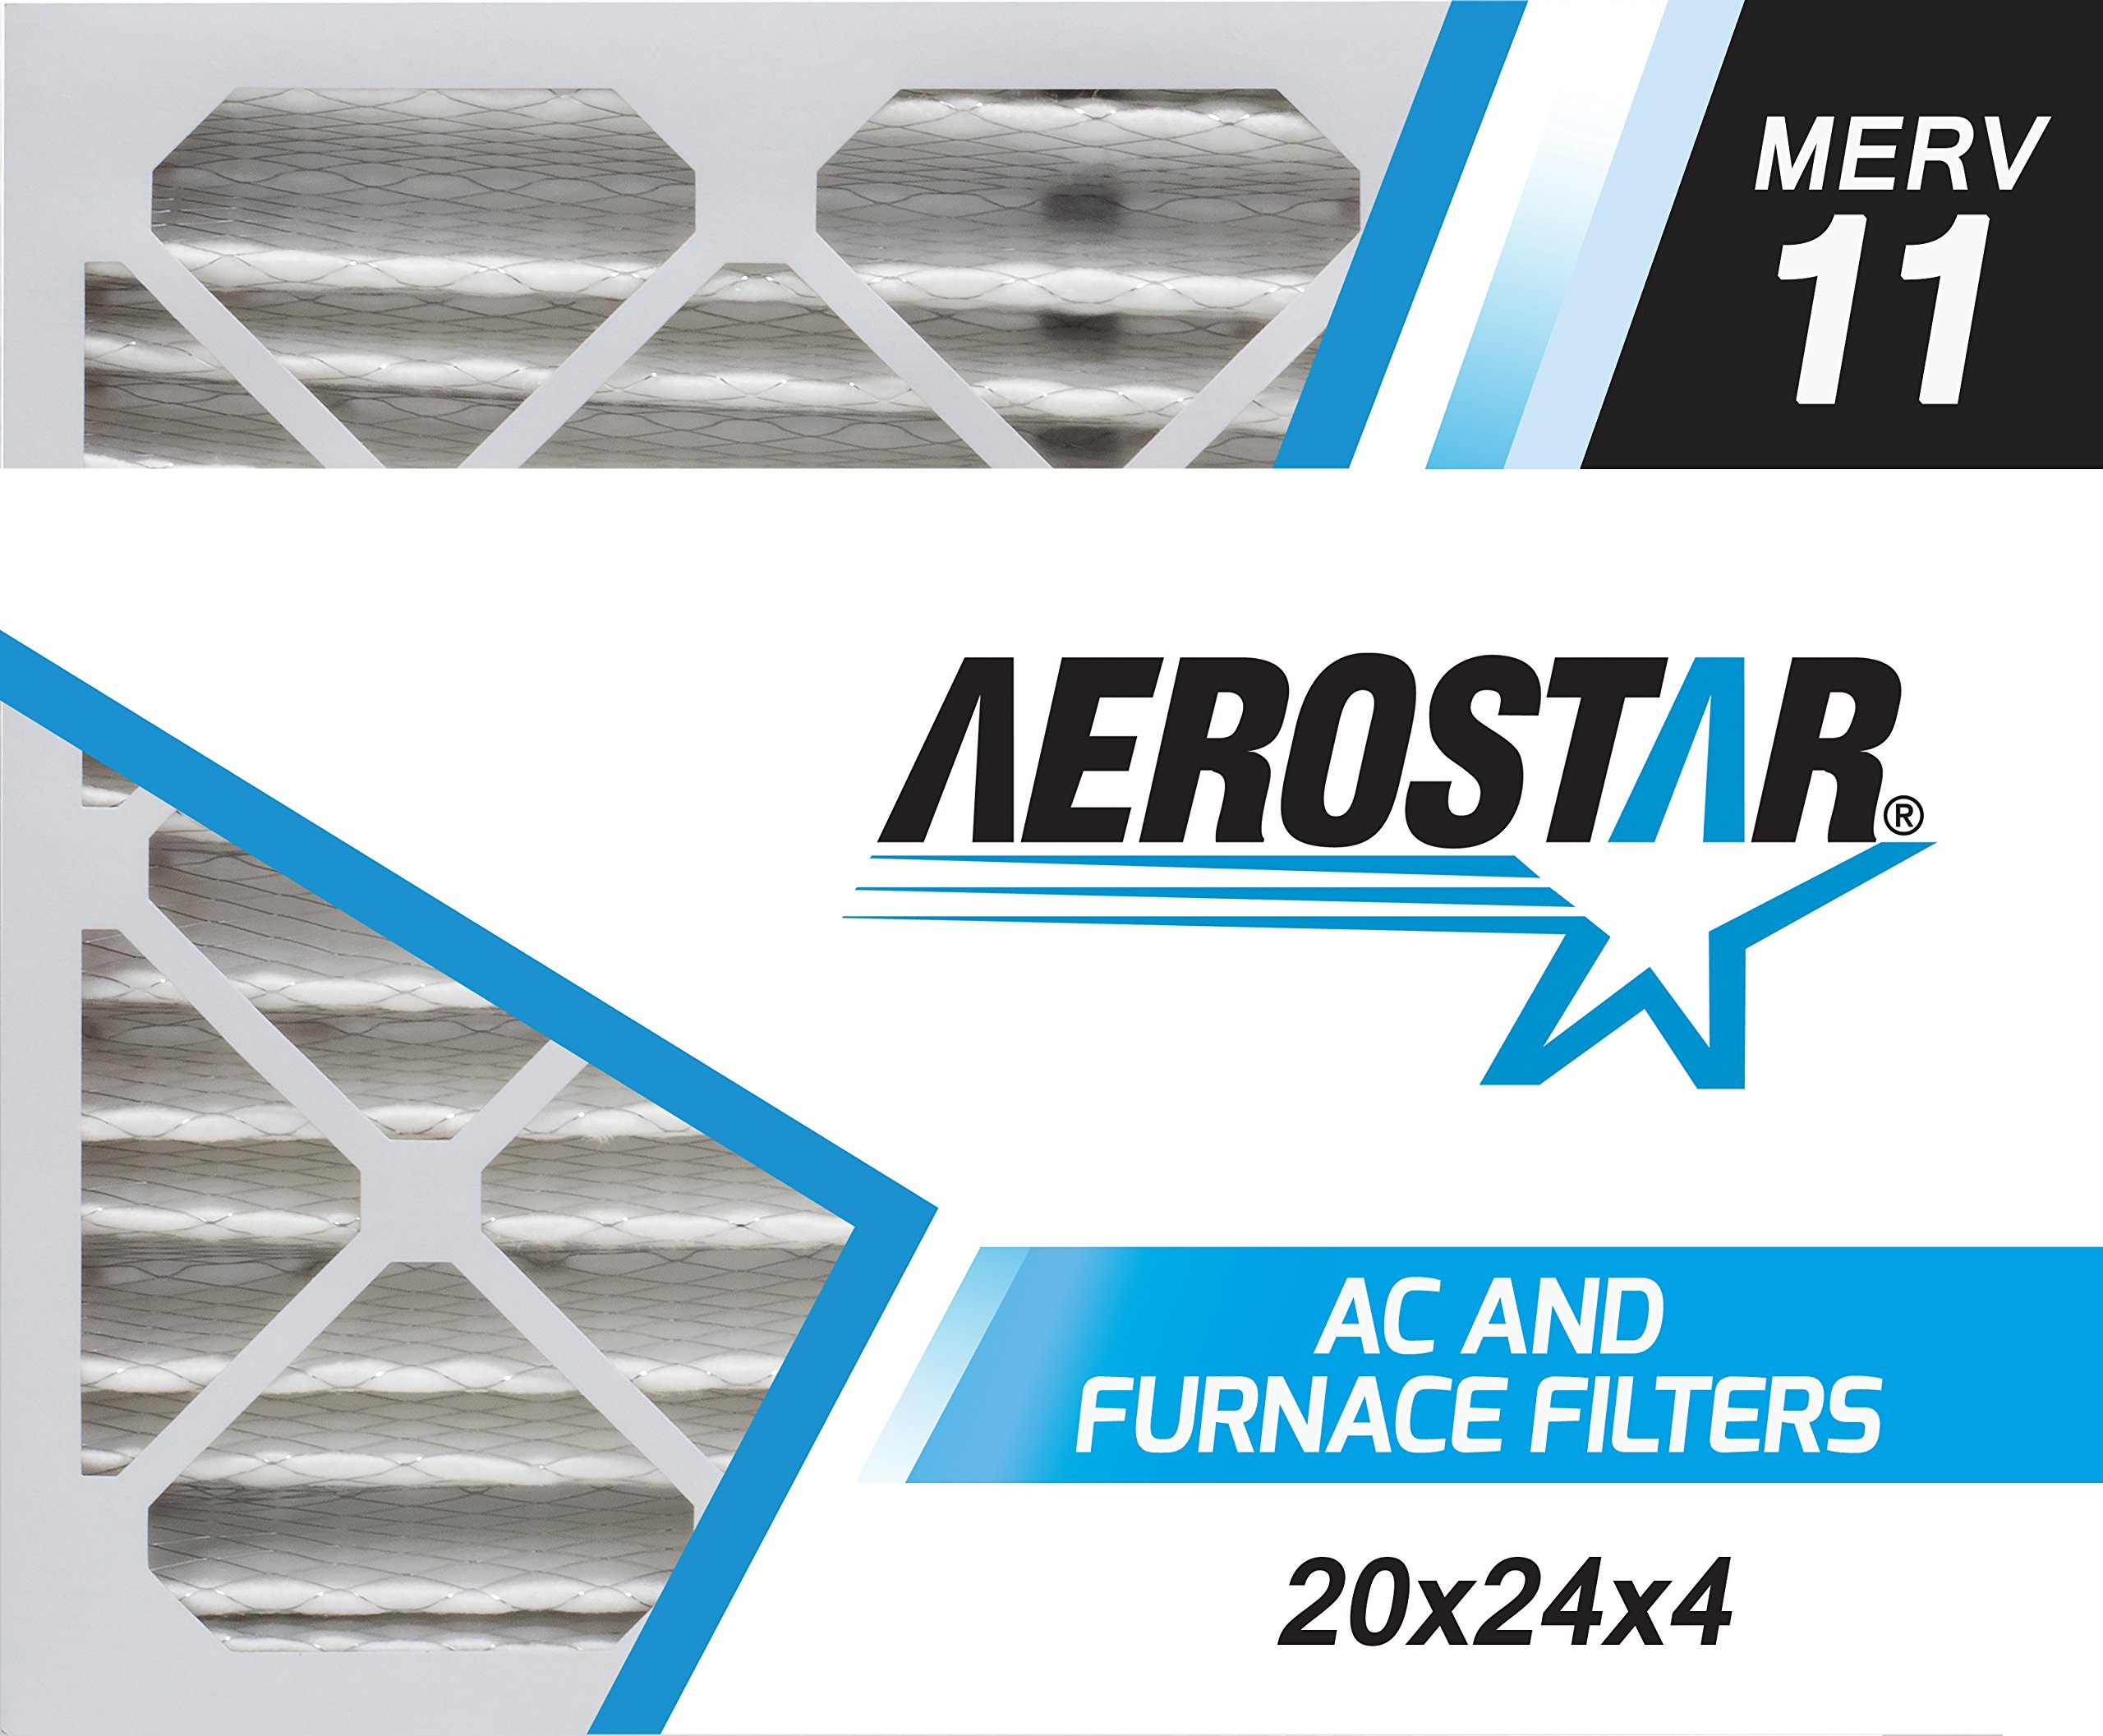 Aerostar 20x24x4 MERV 11, Pleated Air Filter, 20 x 24 x 4, Box of 6, Made in the USA